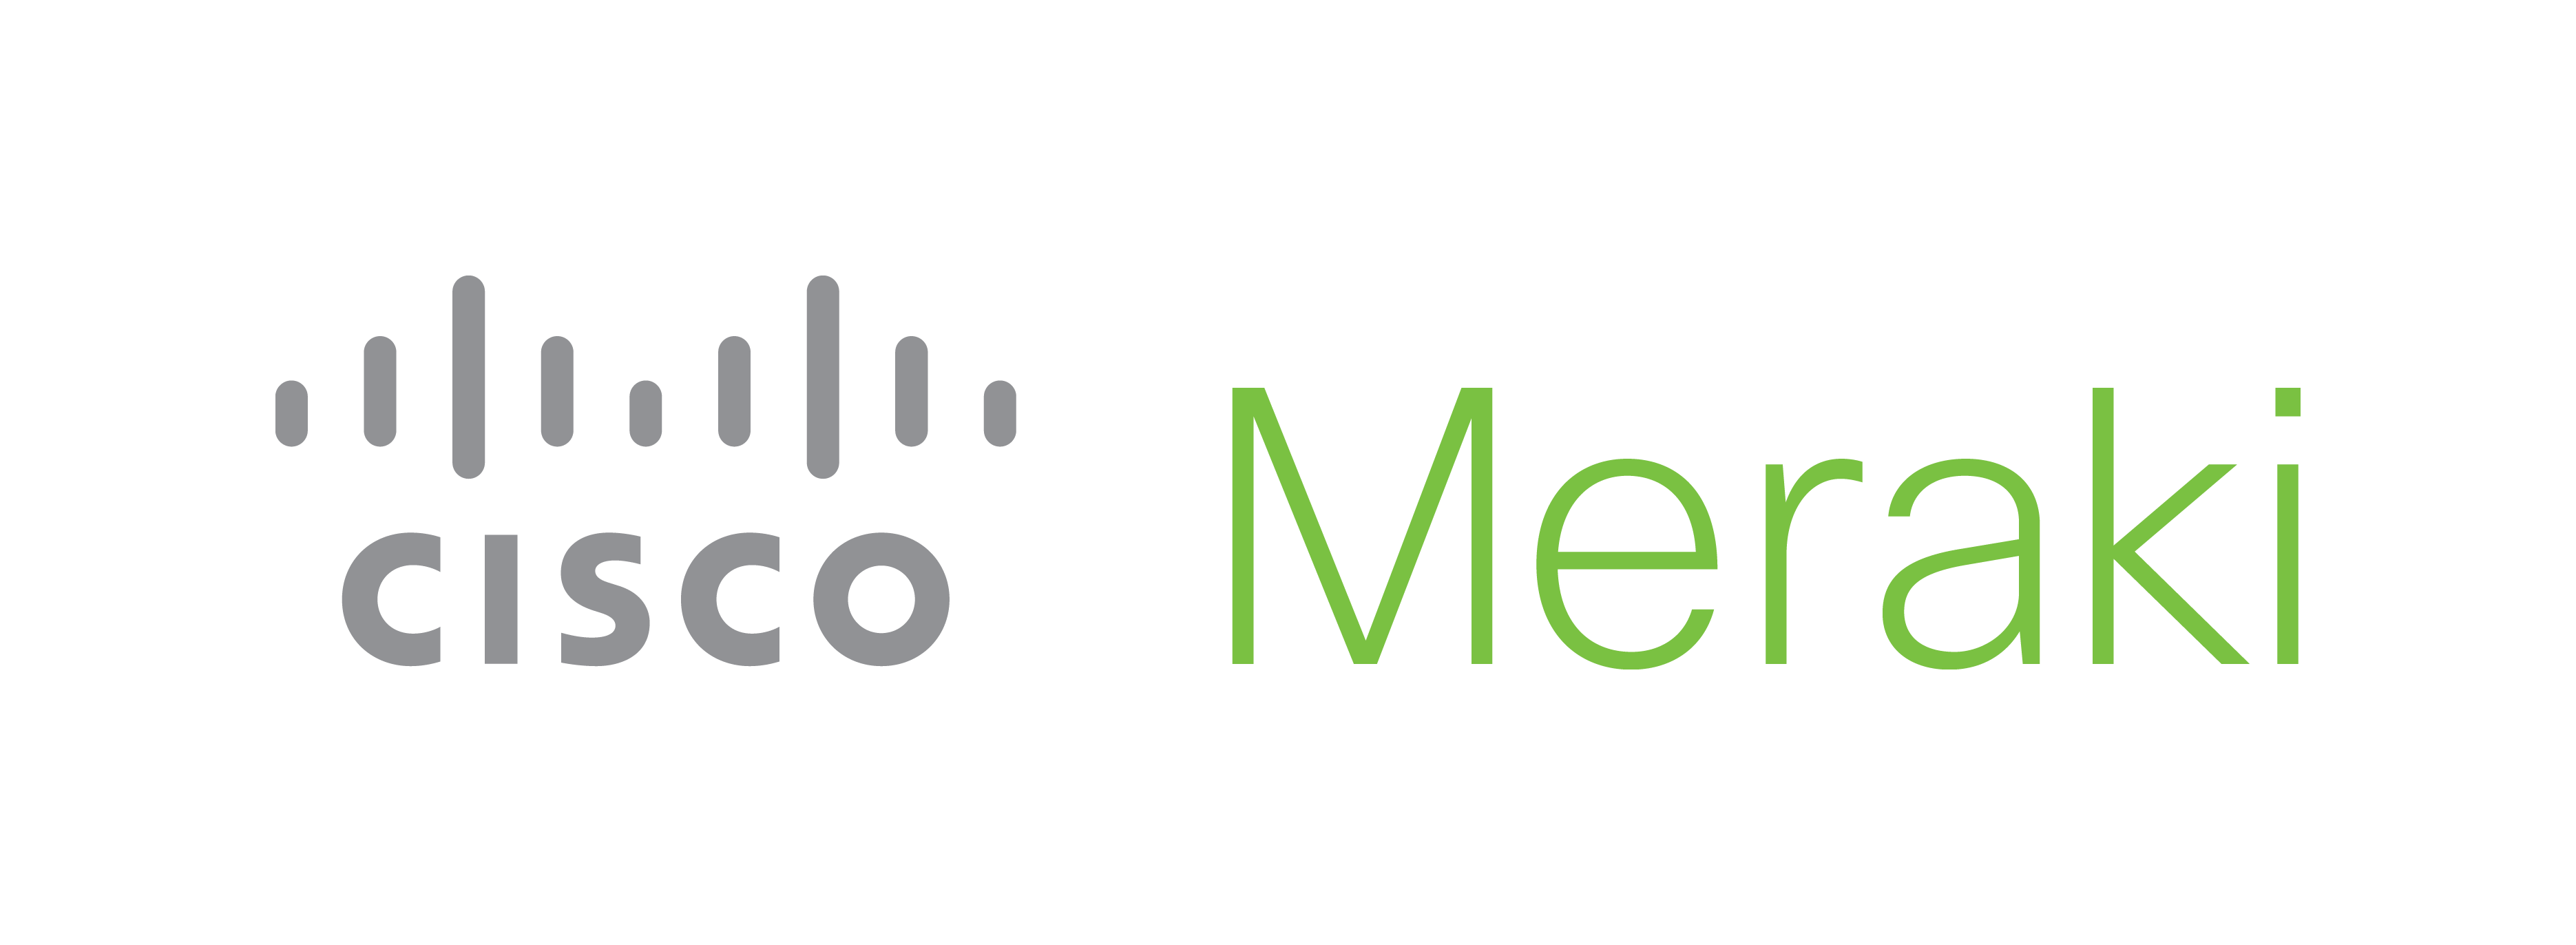 cisco-meraki-logoSpacing